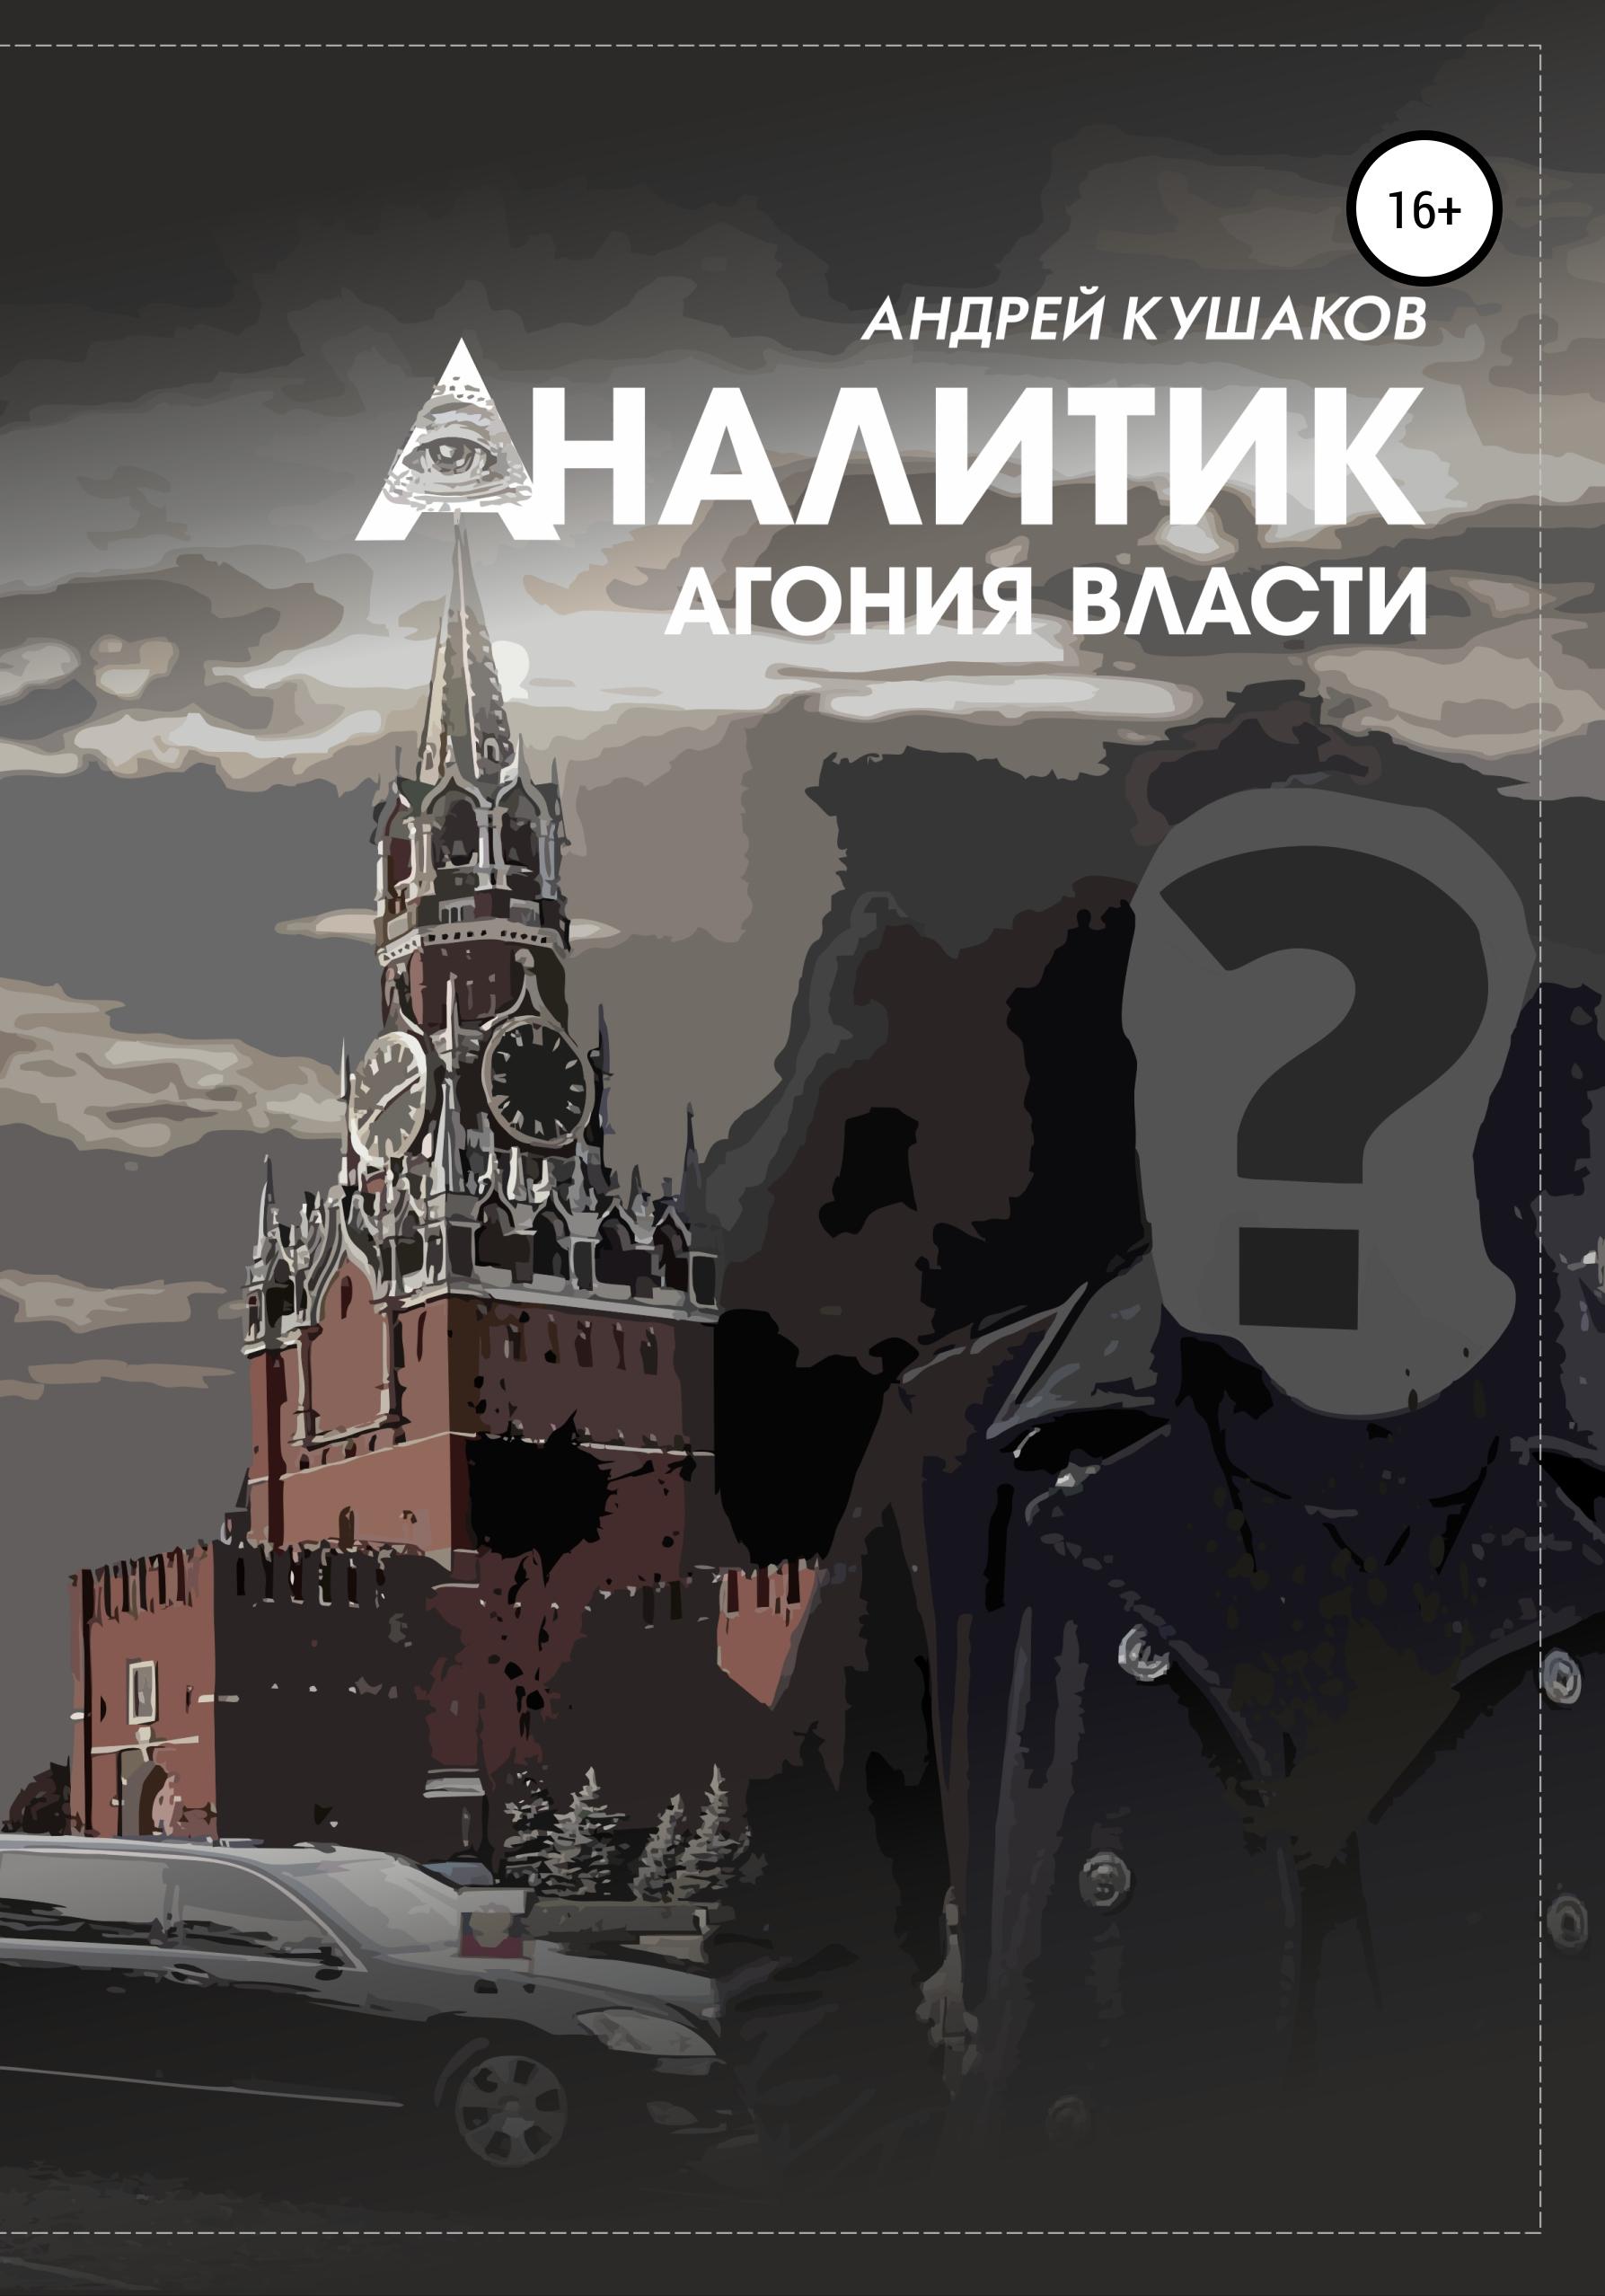 Андрей Кушаков - Аналитик. Агония власти